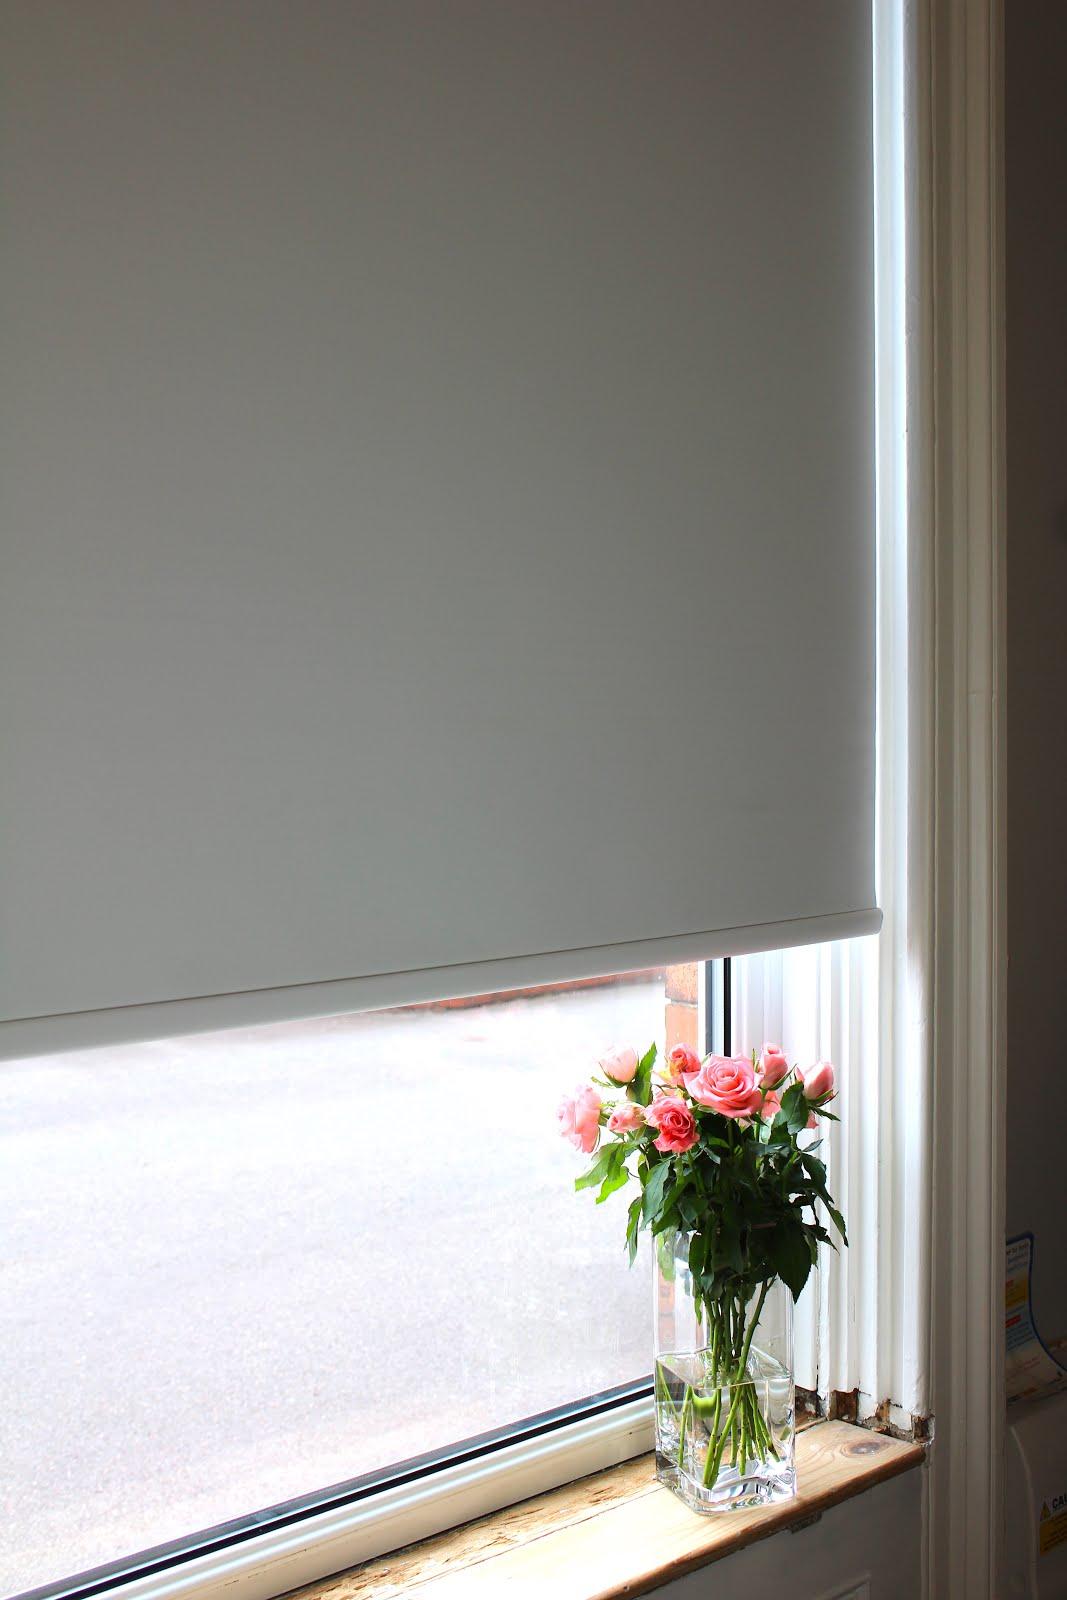 Electric Roller Blind in Living Room